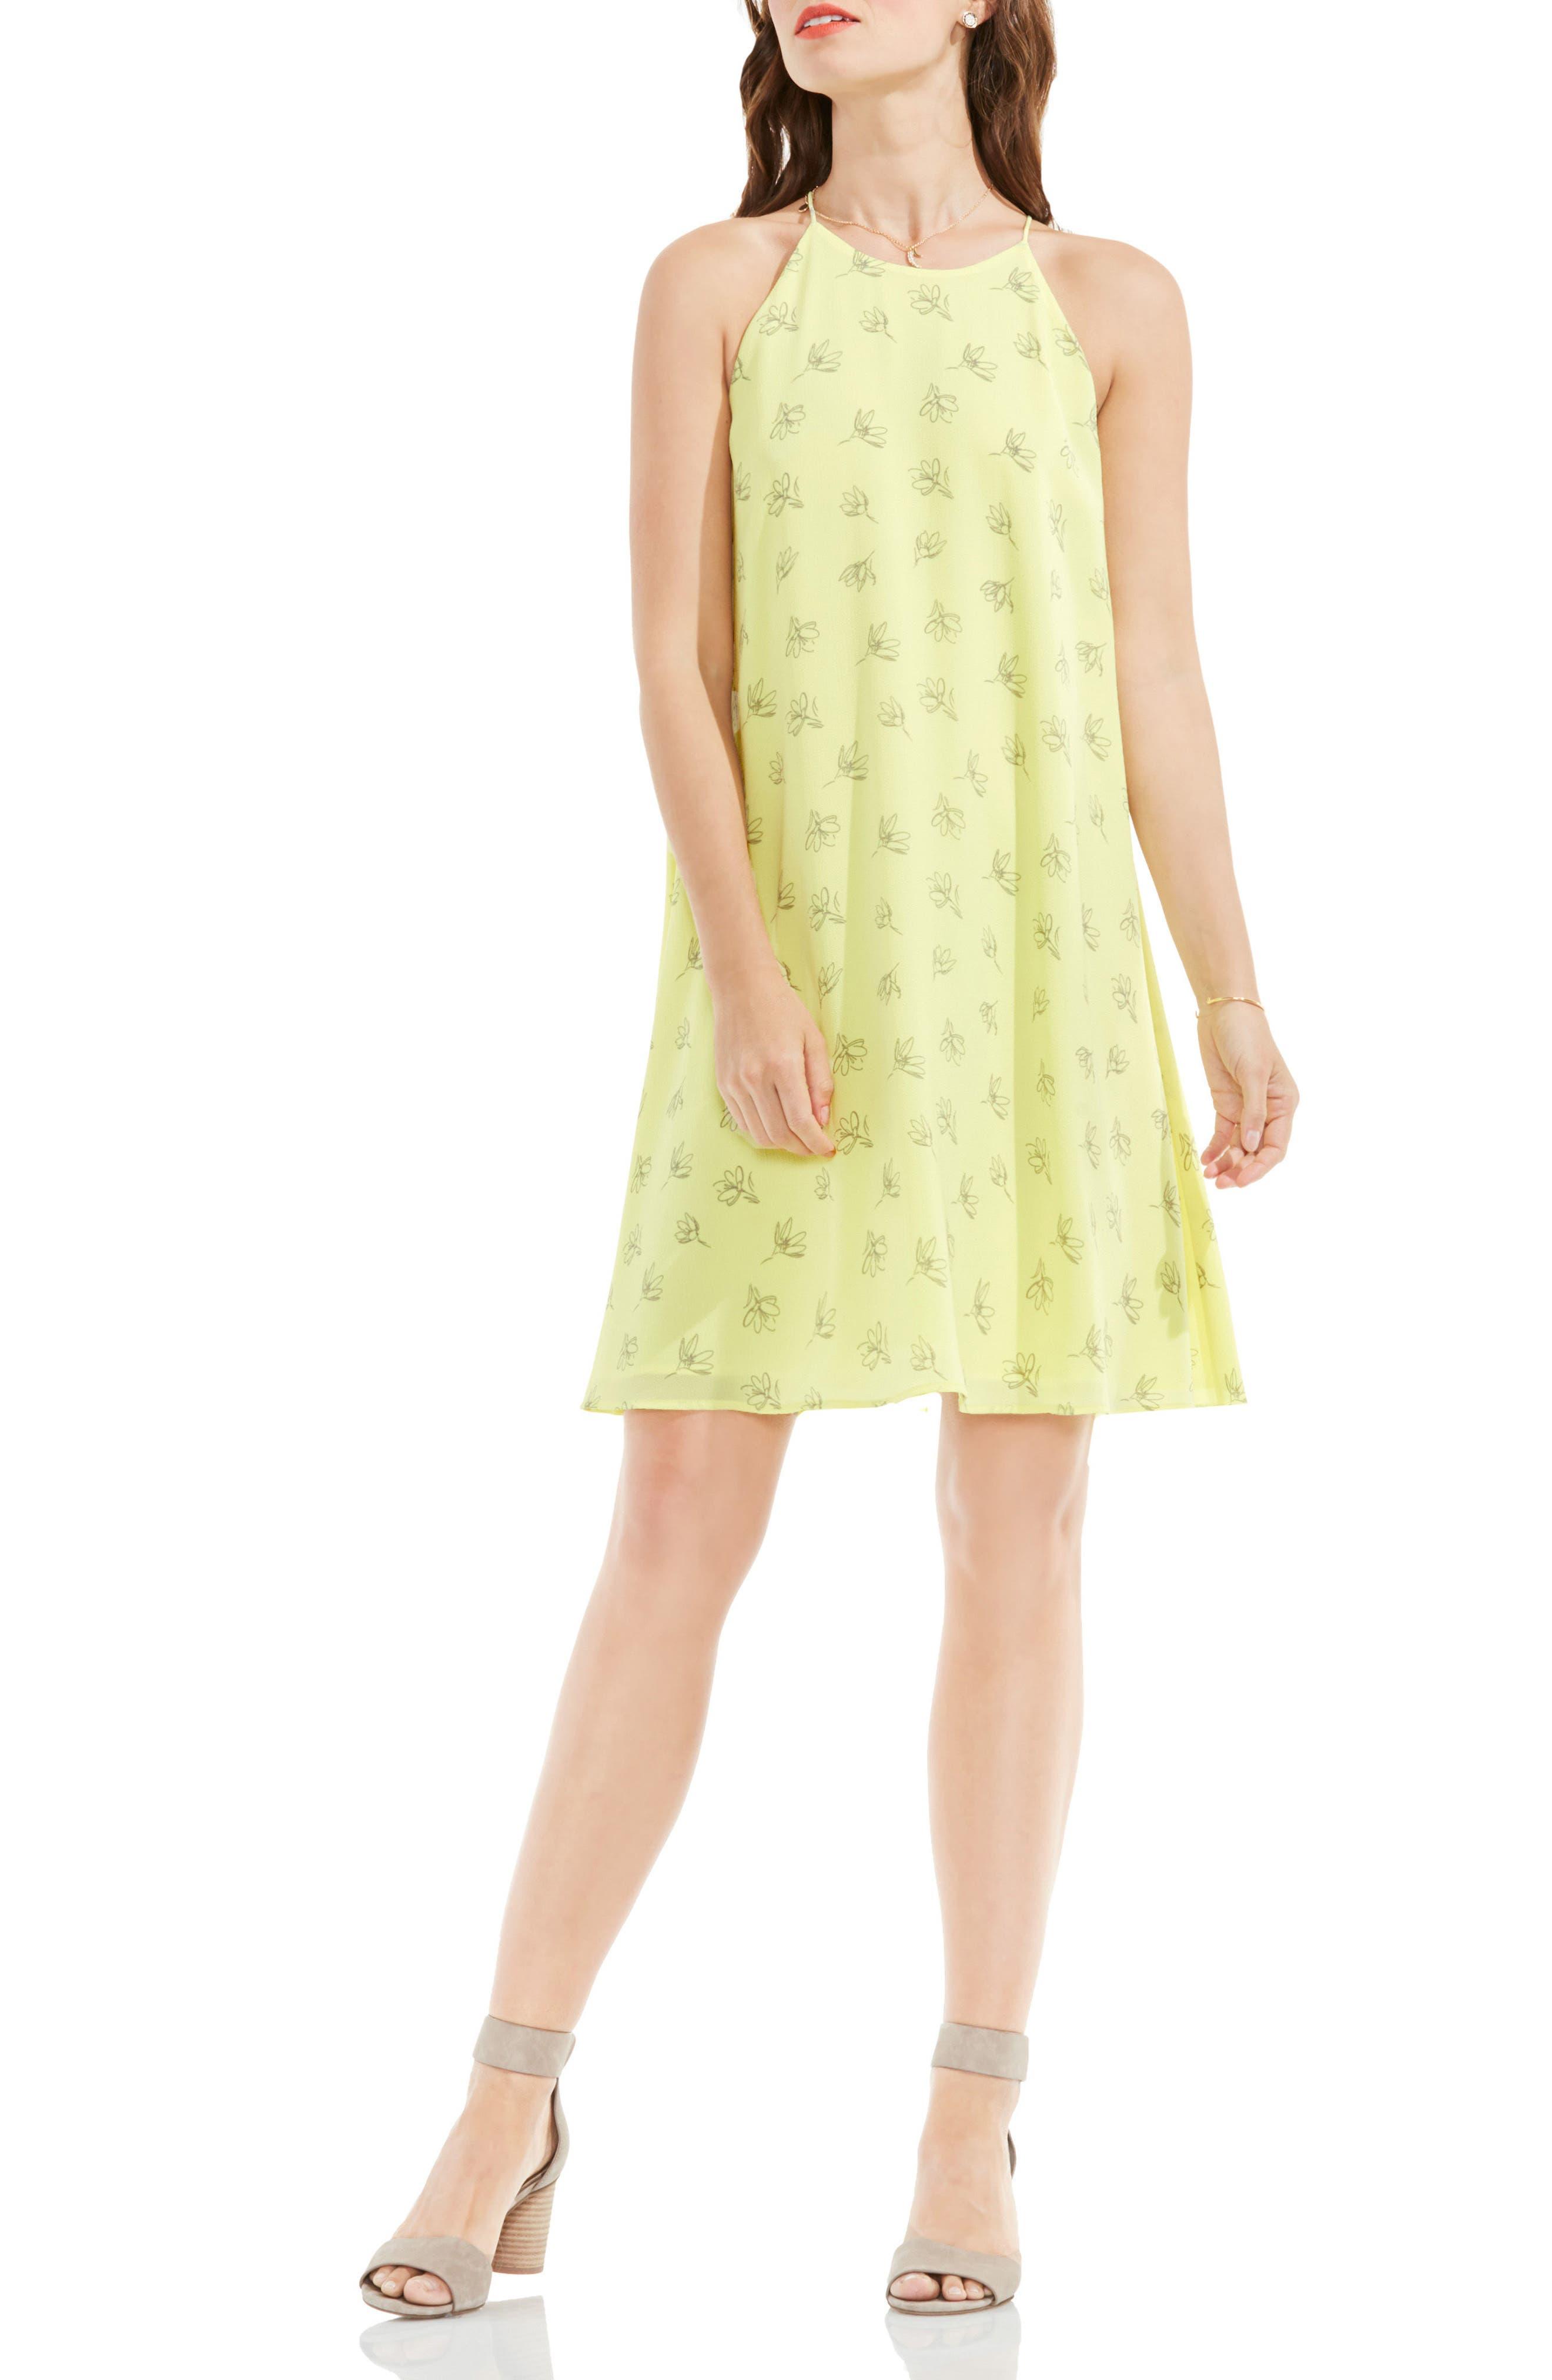 Vince Camuto Fluent Flowers Print Sleeveless A-Line Dress